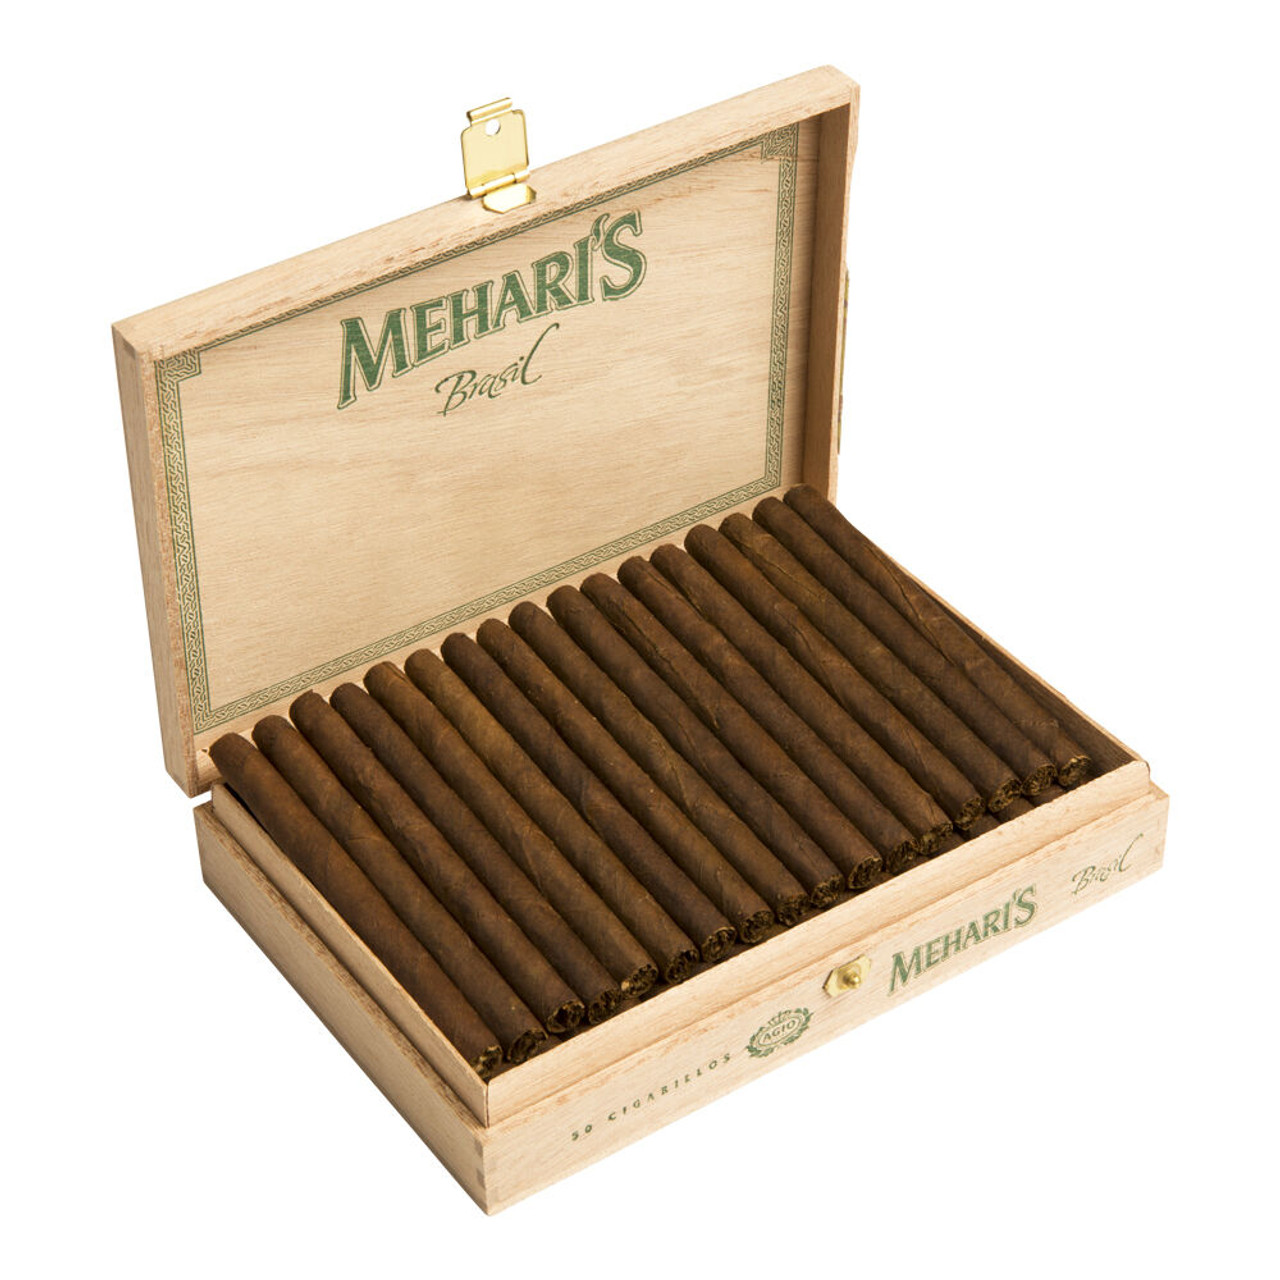 Agio Mehari's Cigarillos Brazil Cigars - 4 x 23 (Box of 50)